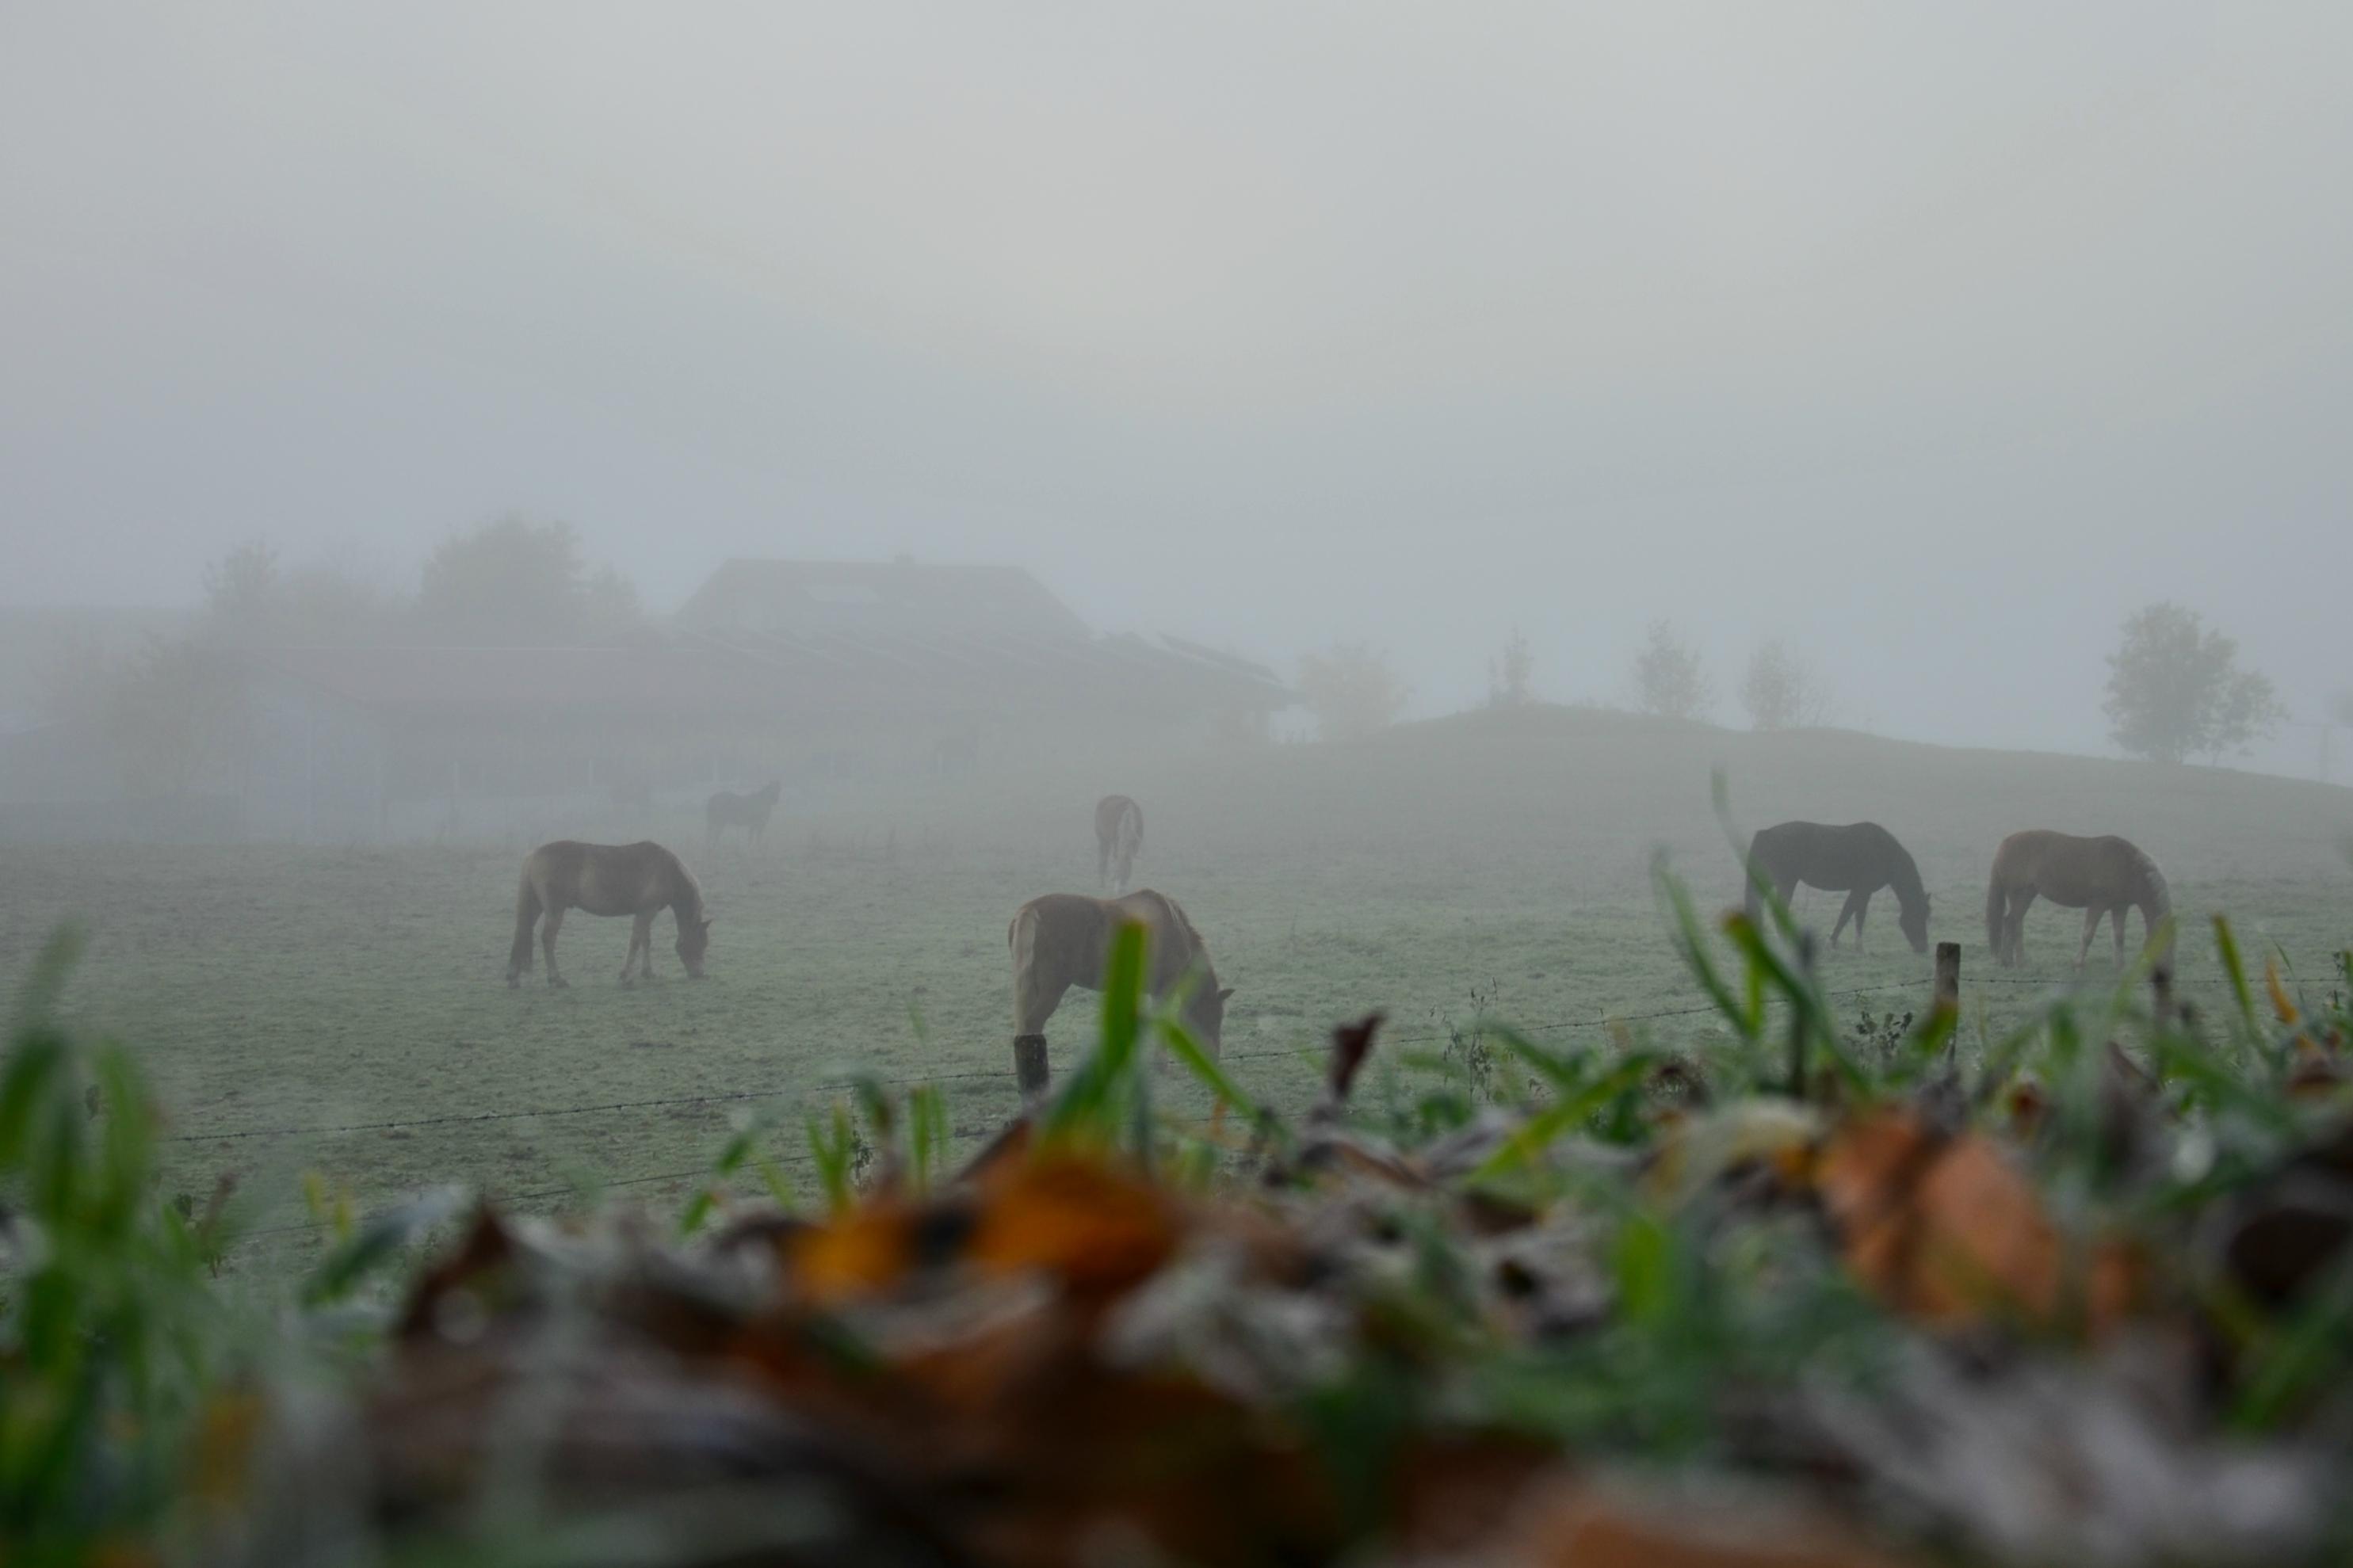 H0120 Pferdekoppel im Morgennebel.jpg